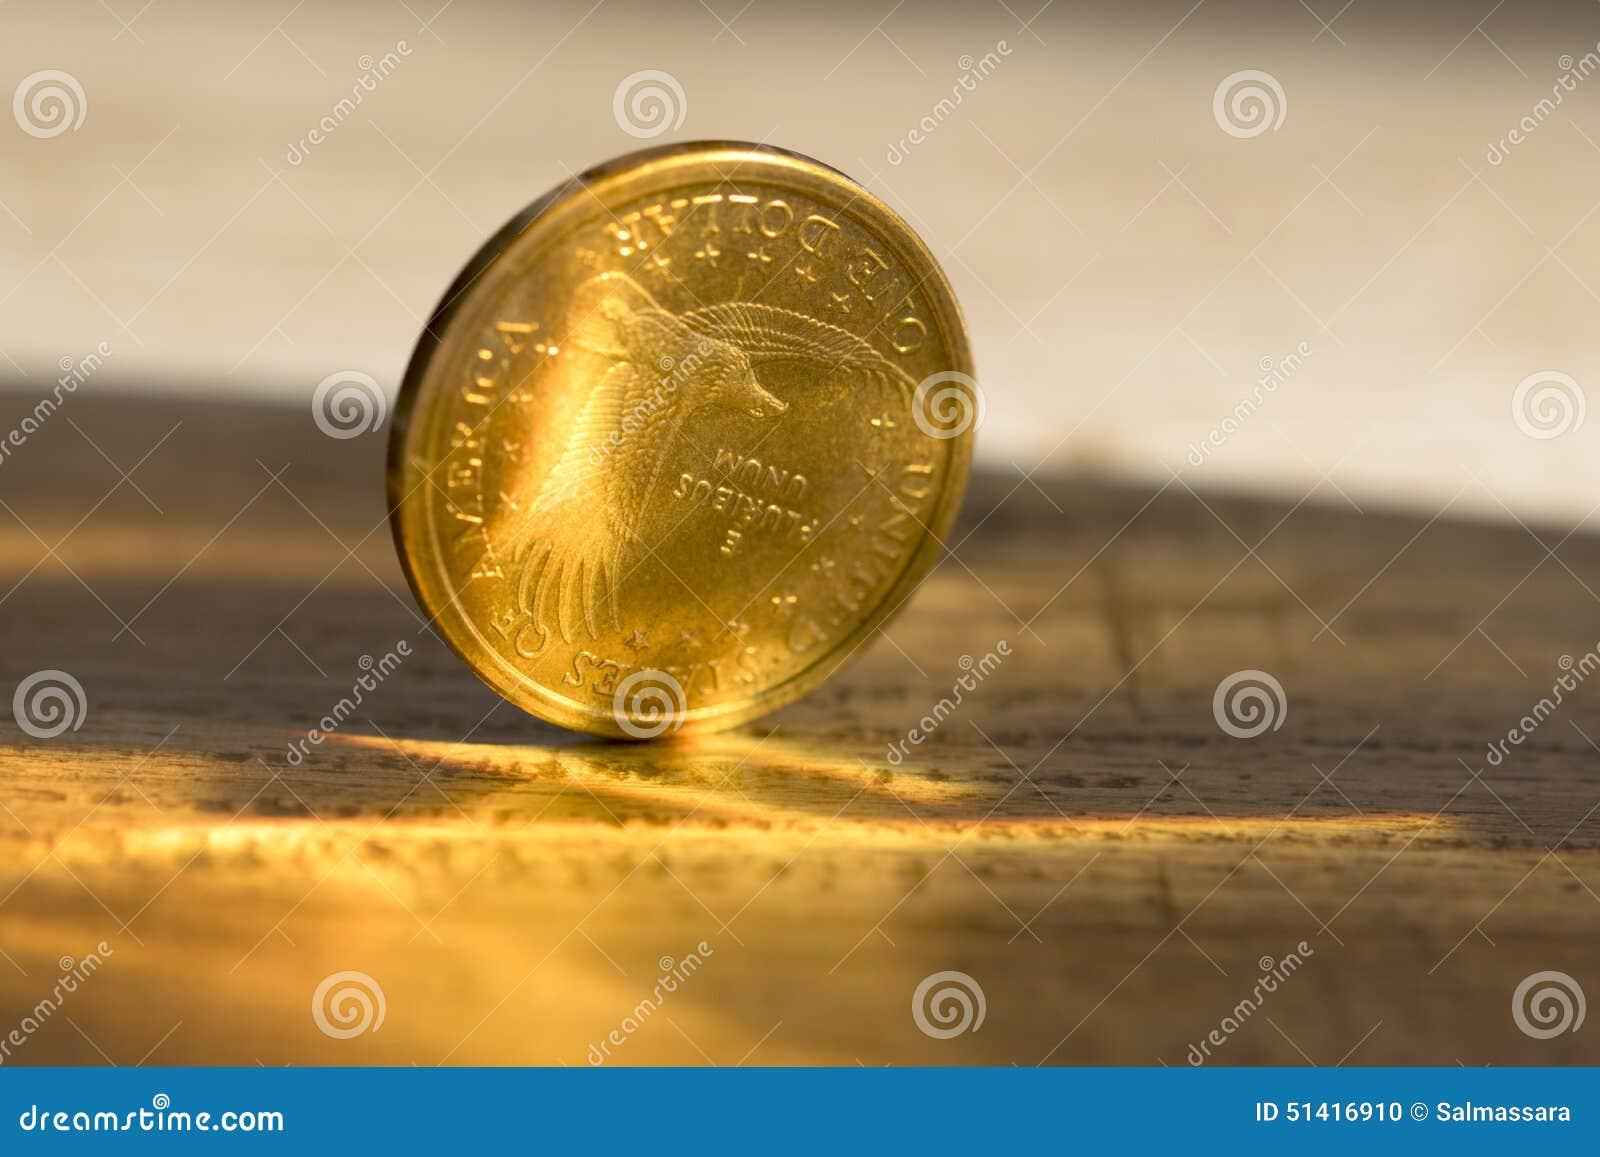 Dollar is world money of exchange